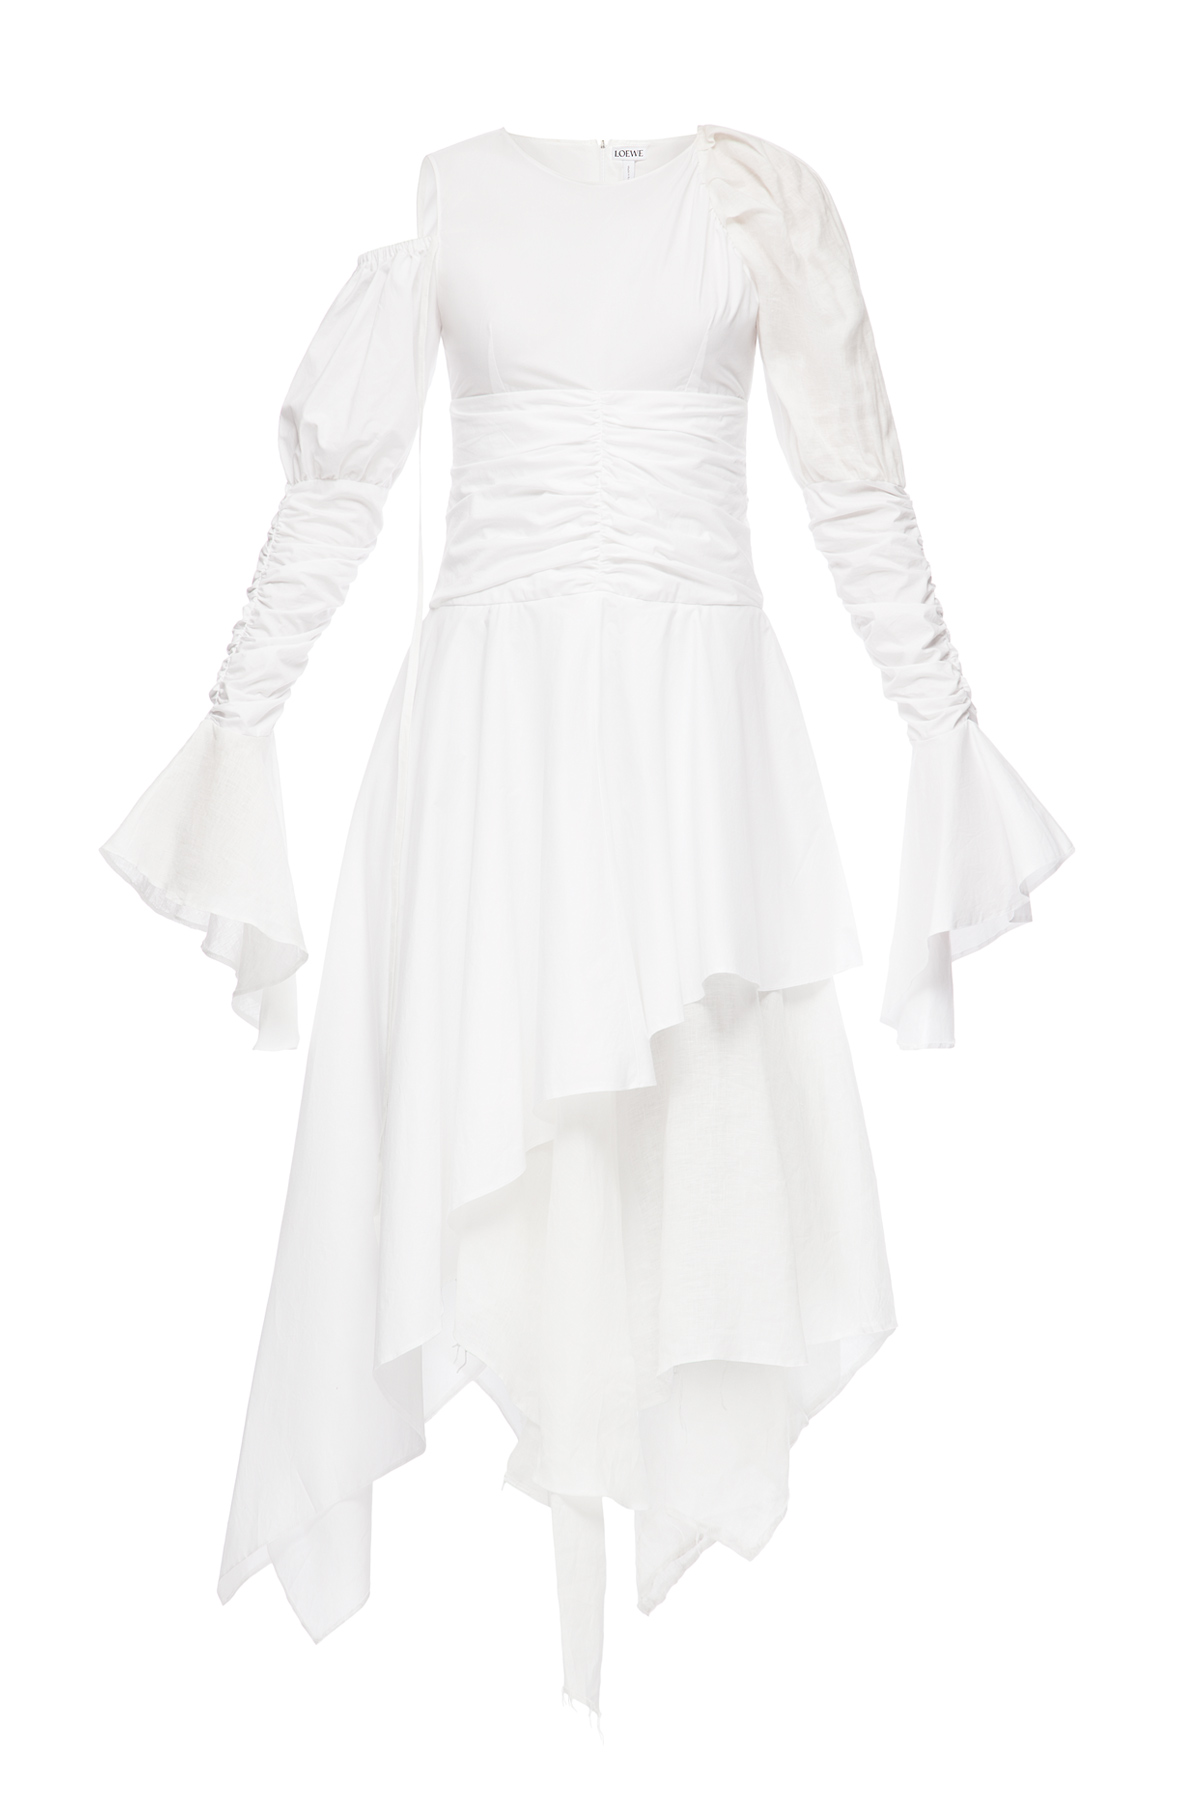 LOEWE Gathered Dress White front